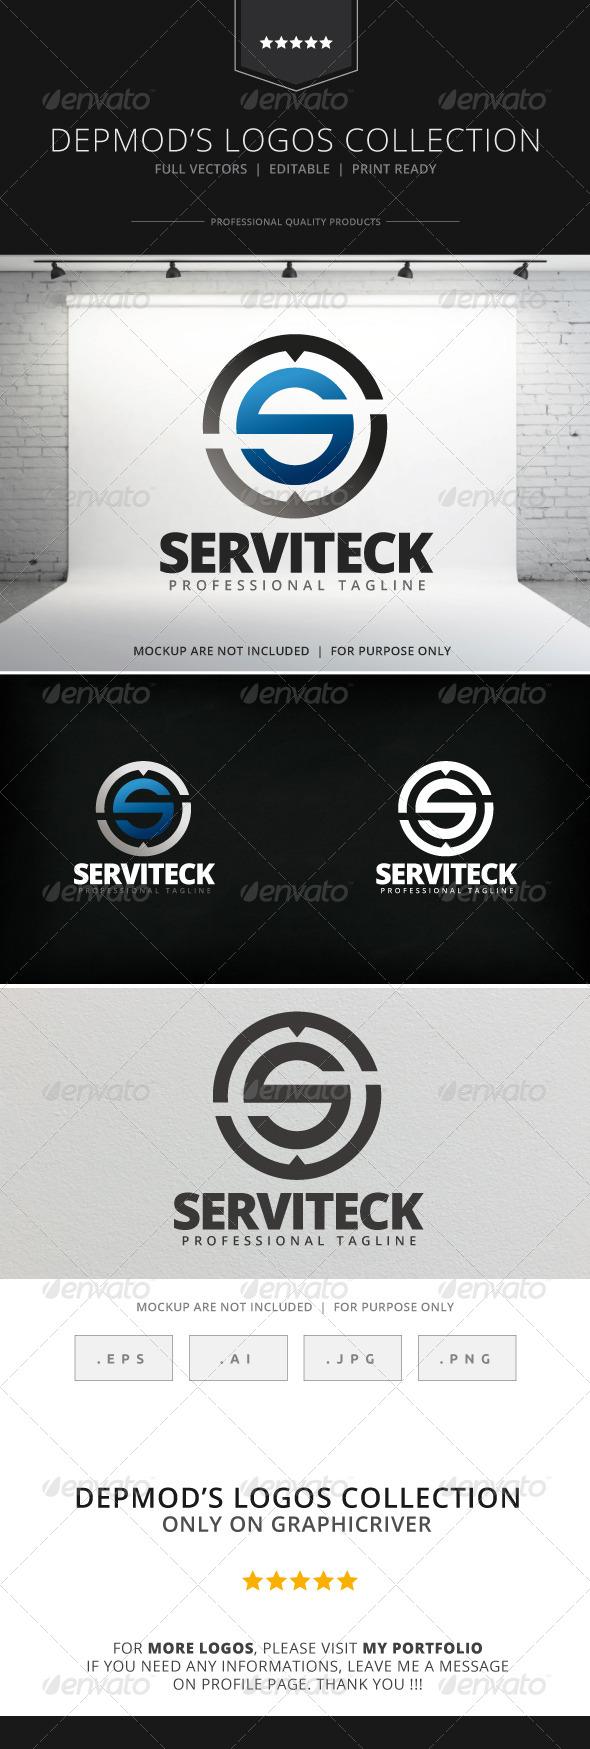 GraphicRiver Serviteck Logo 7963268